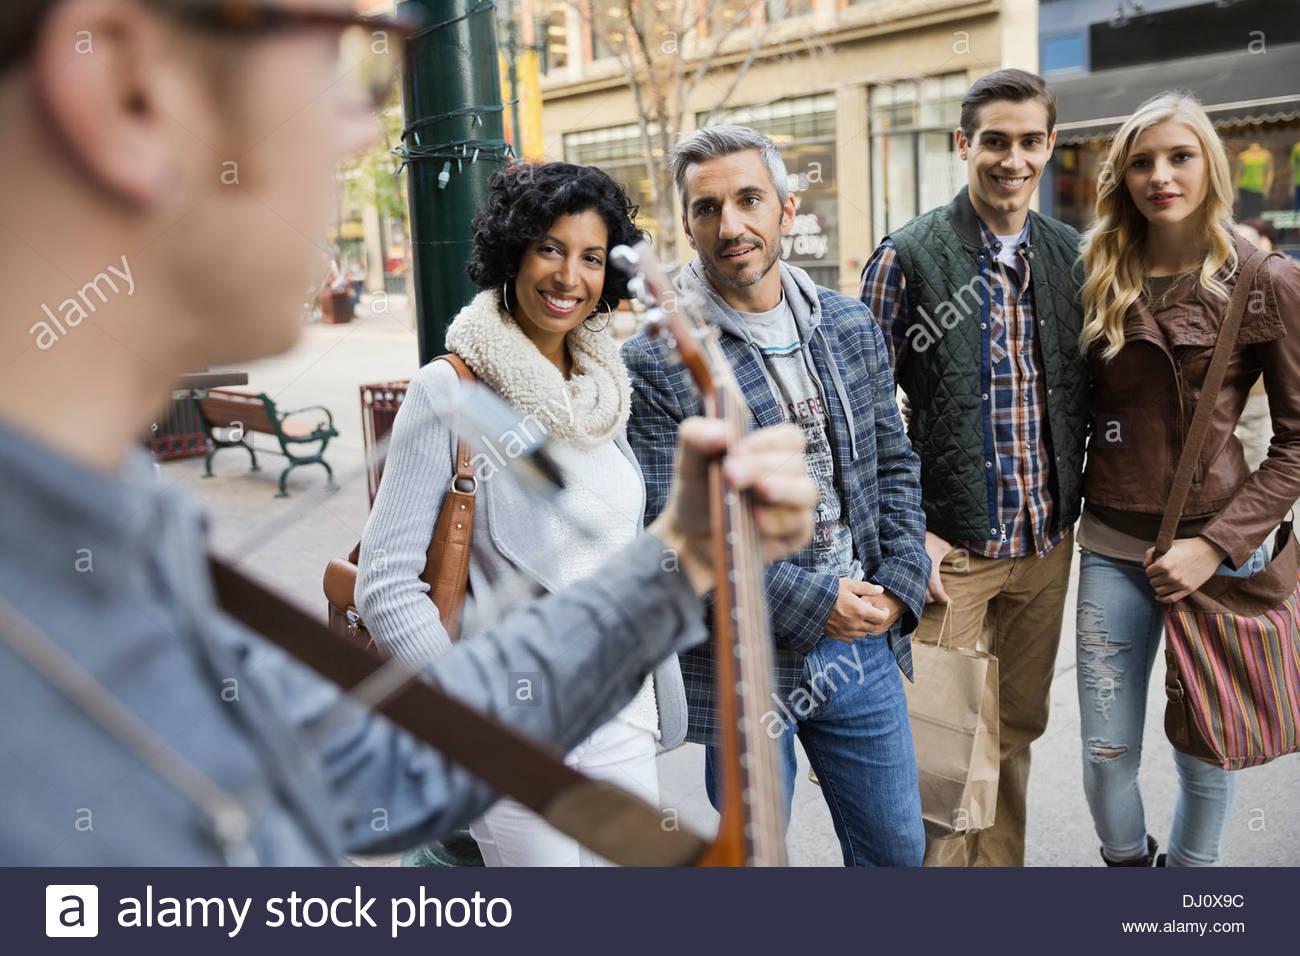 Pedestrians listening to street musician - Stock Image